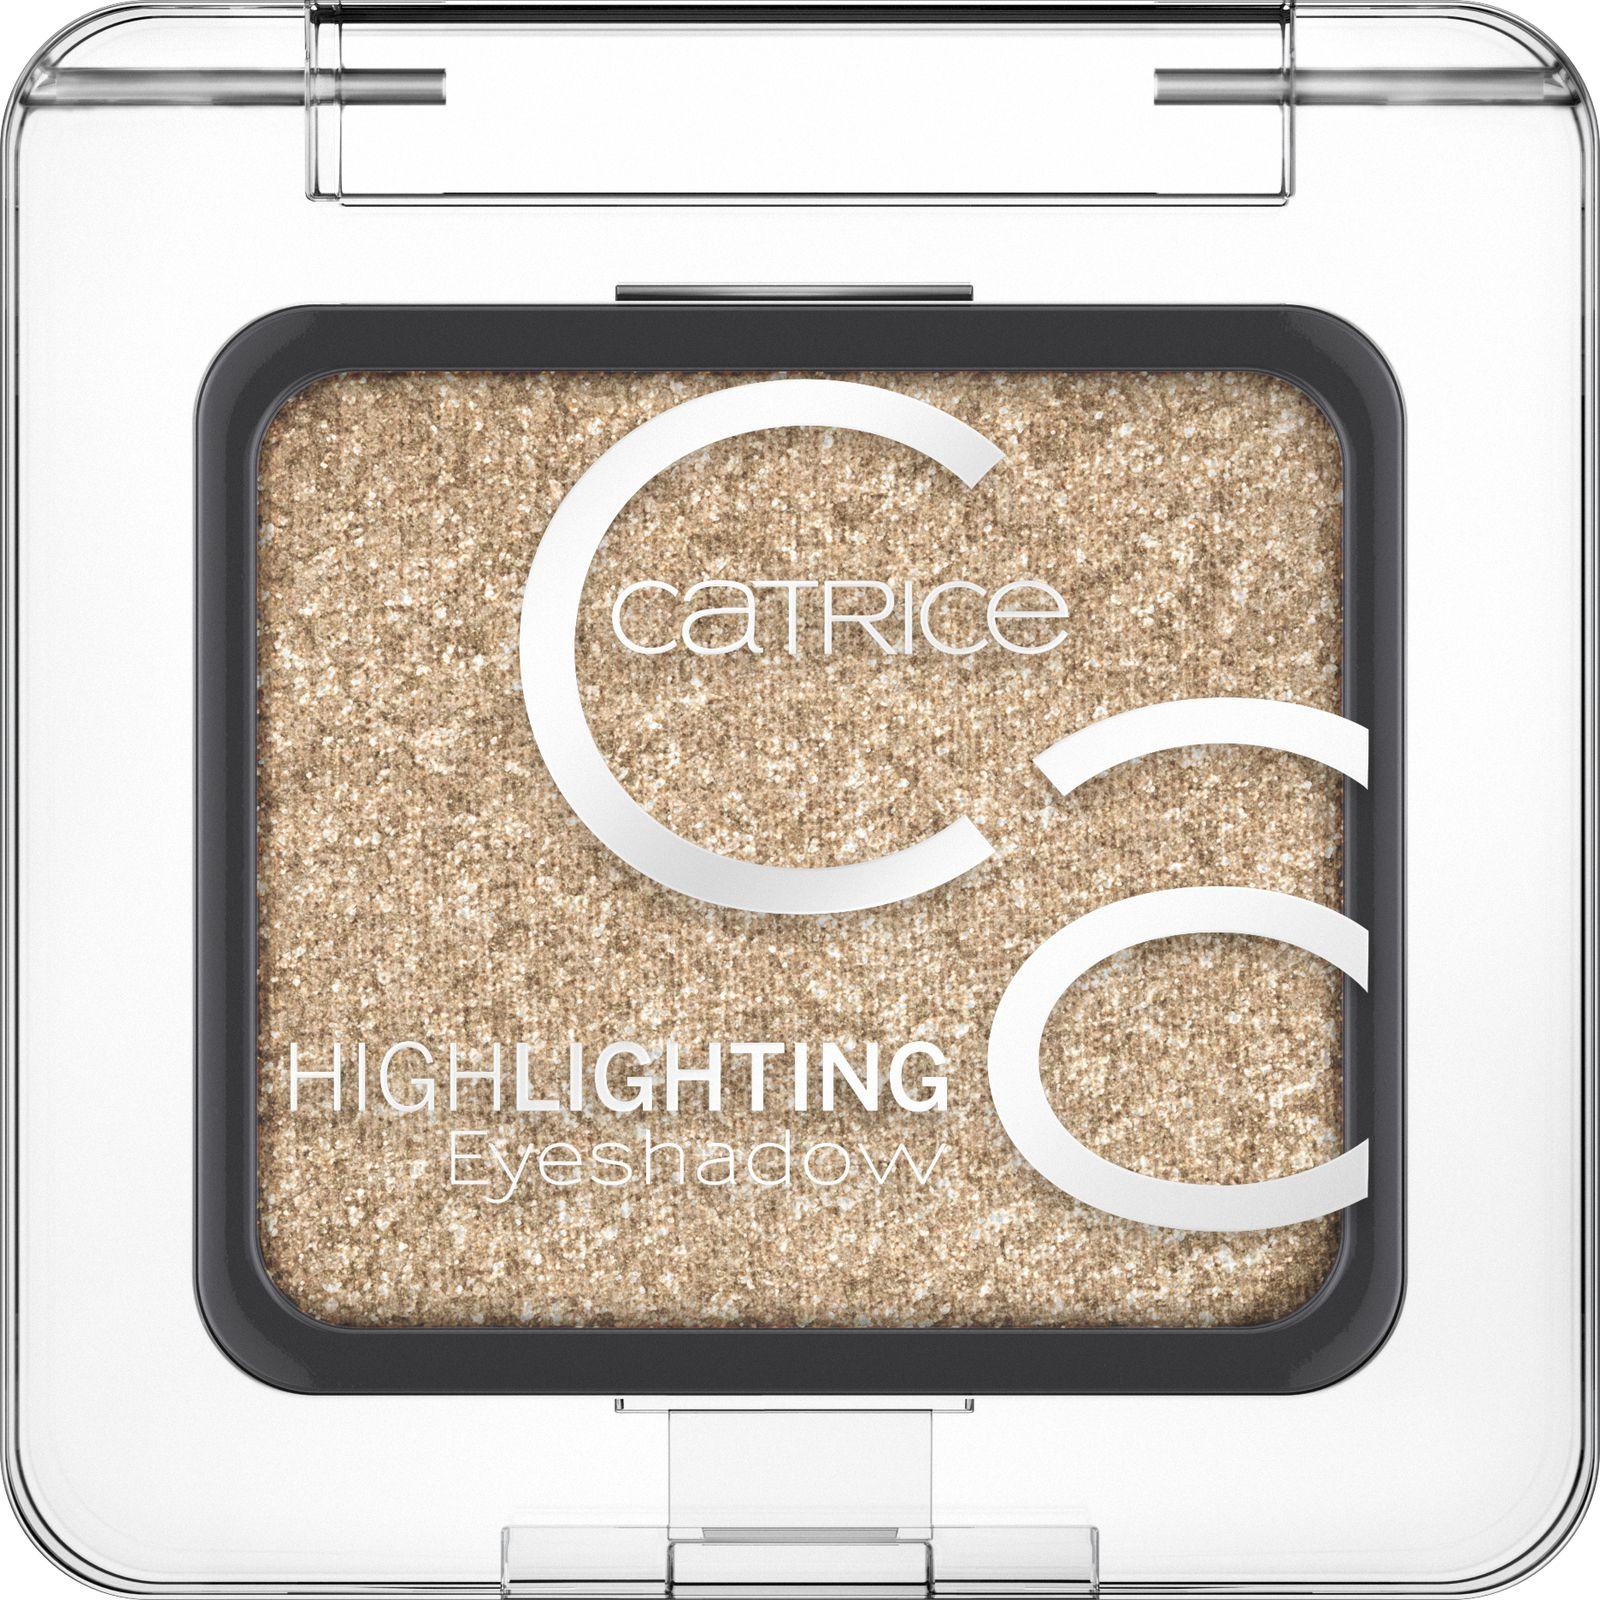 Тени для век Catrice Highlighting Eyeshadow, 050 Diamond Dust